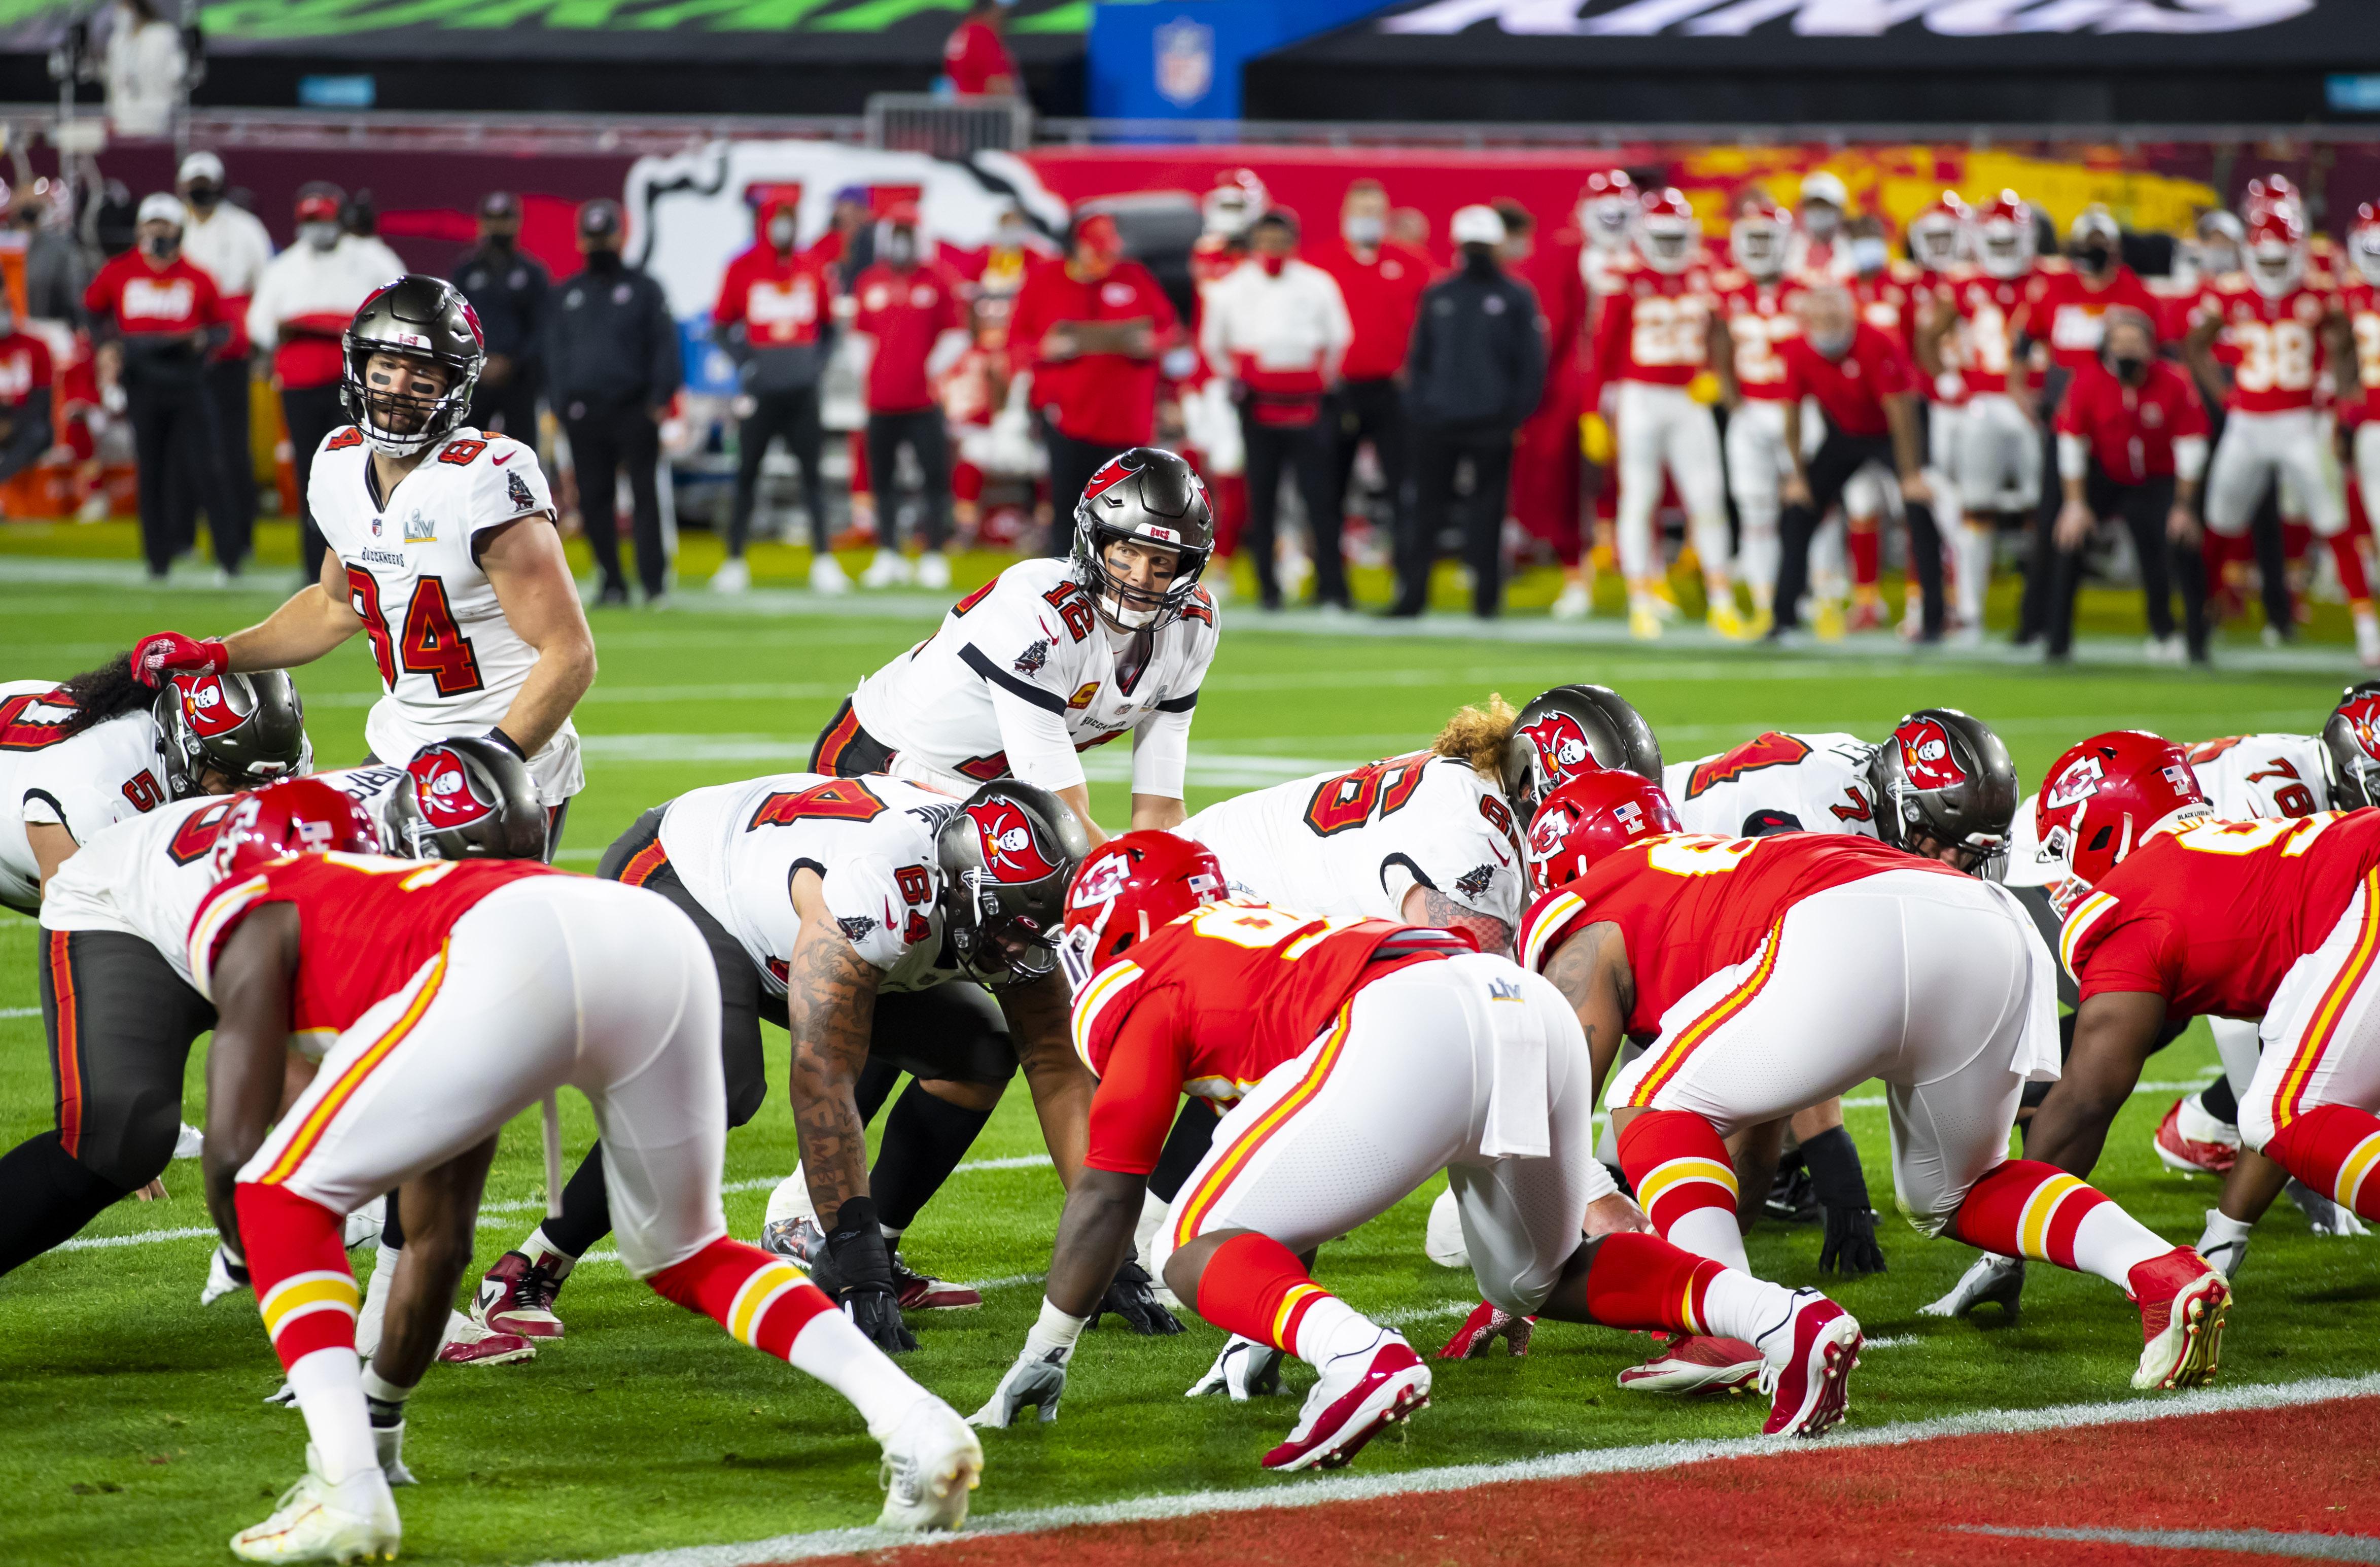 Feb 4, 2021; Tampa, FL, USA;  Tampa Bay Buccaneers quarterback Tom Brady (12) against the Kansas City Chiefs in Super Bowl LV at Raymond James Stadium.  / Mark J. Rebilas-USA TODAY Sports/File Photo